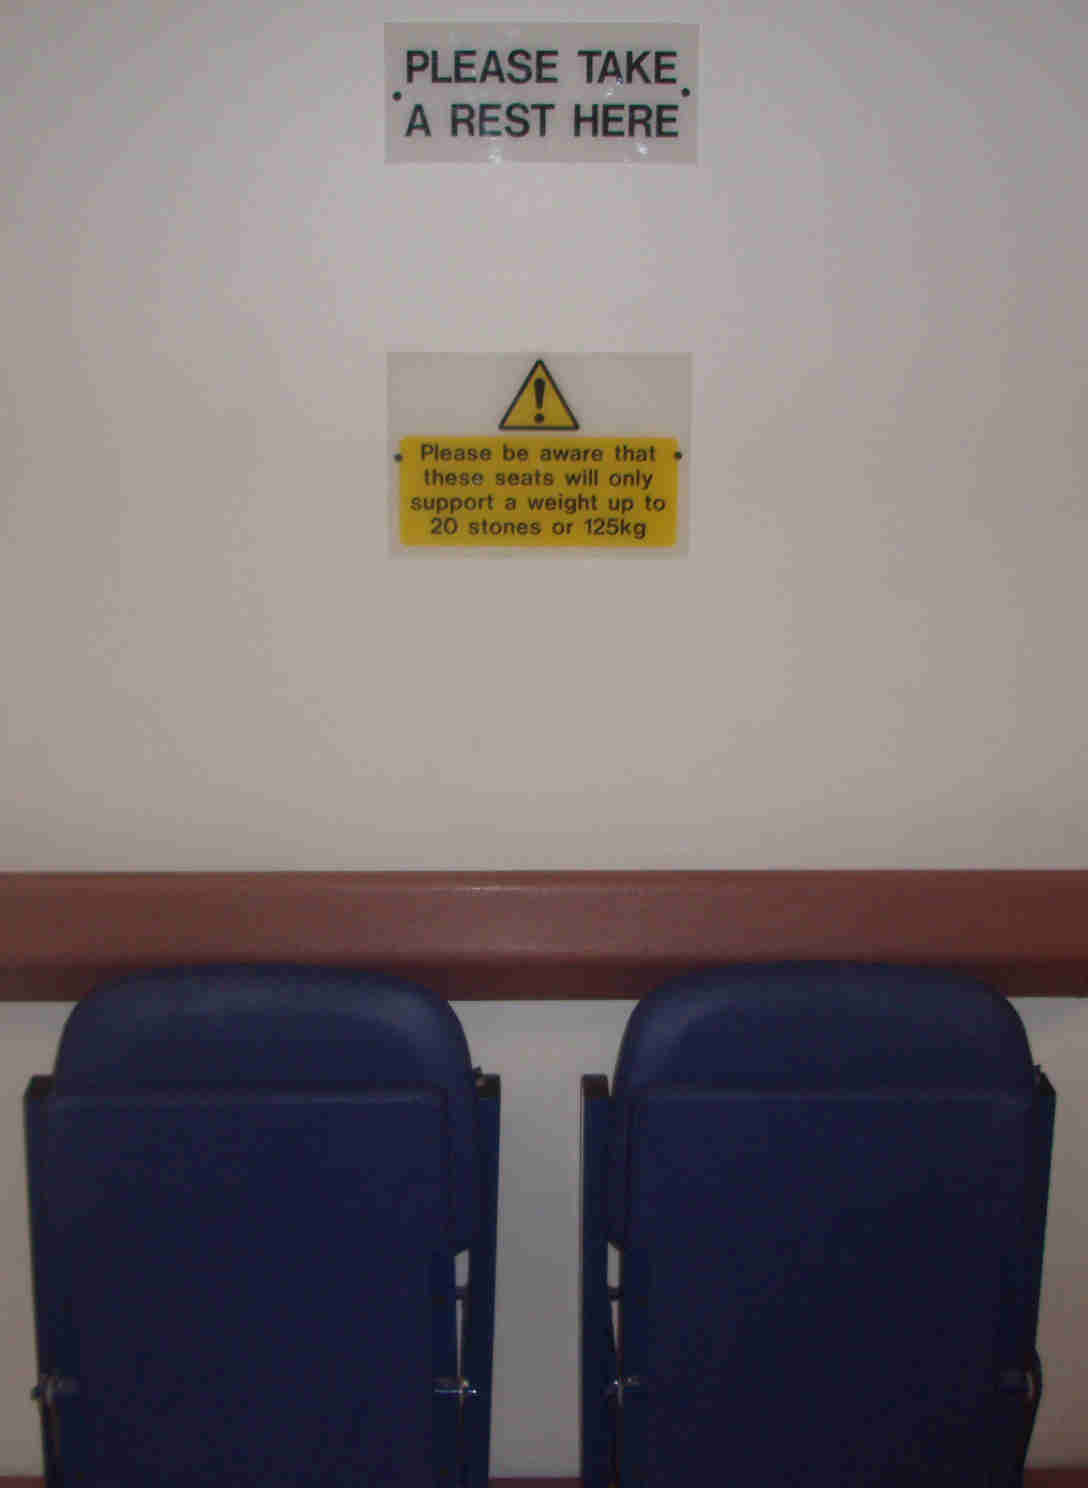 Seats in Hospital Corridor